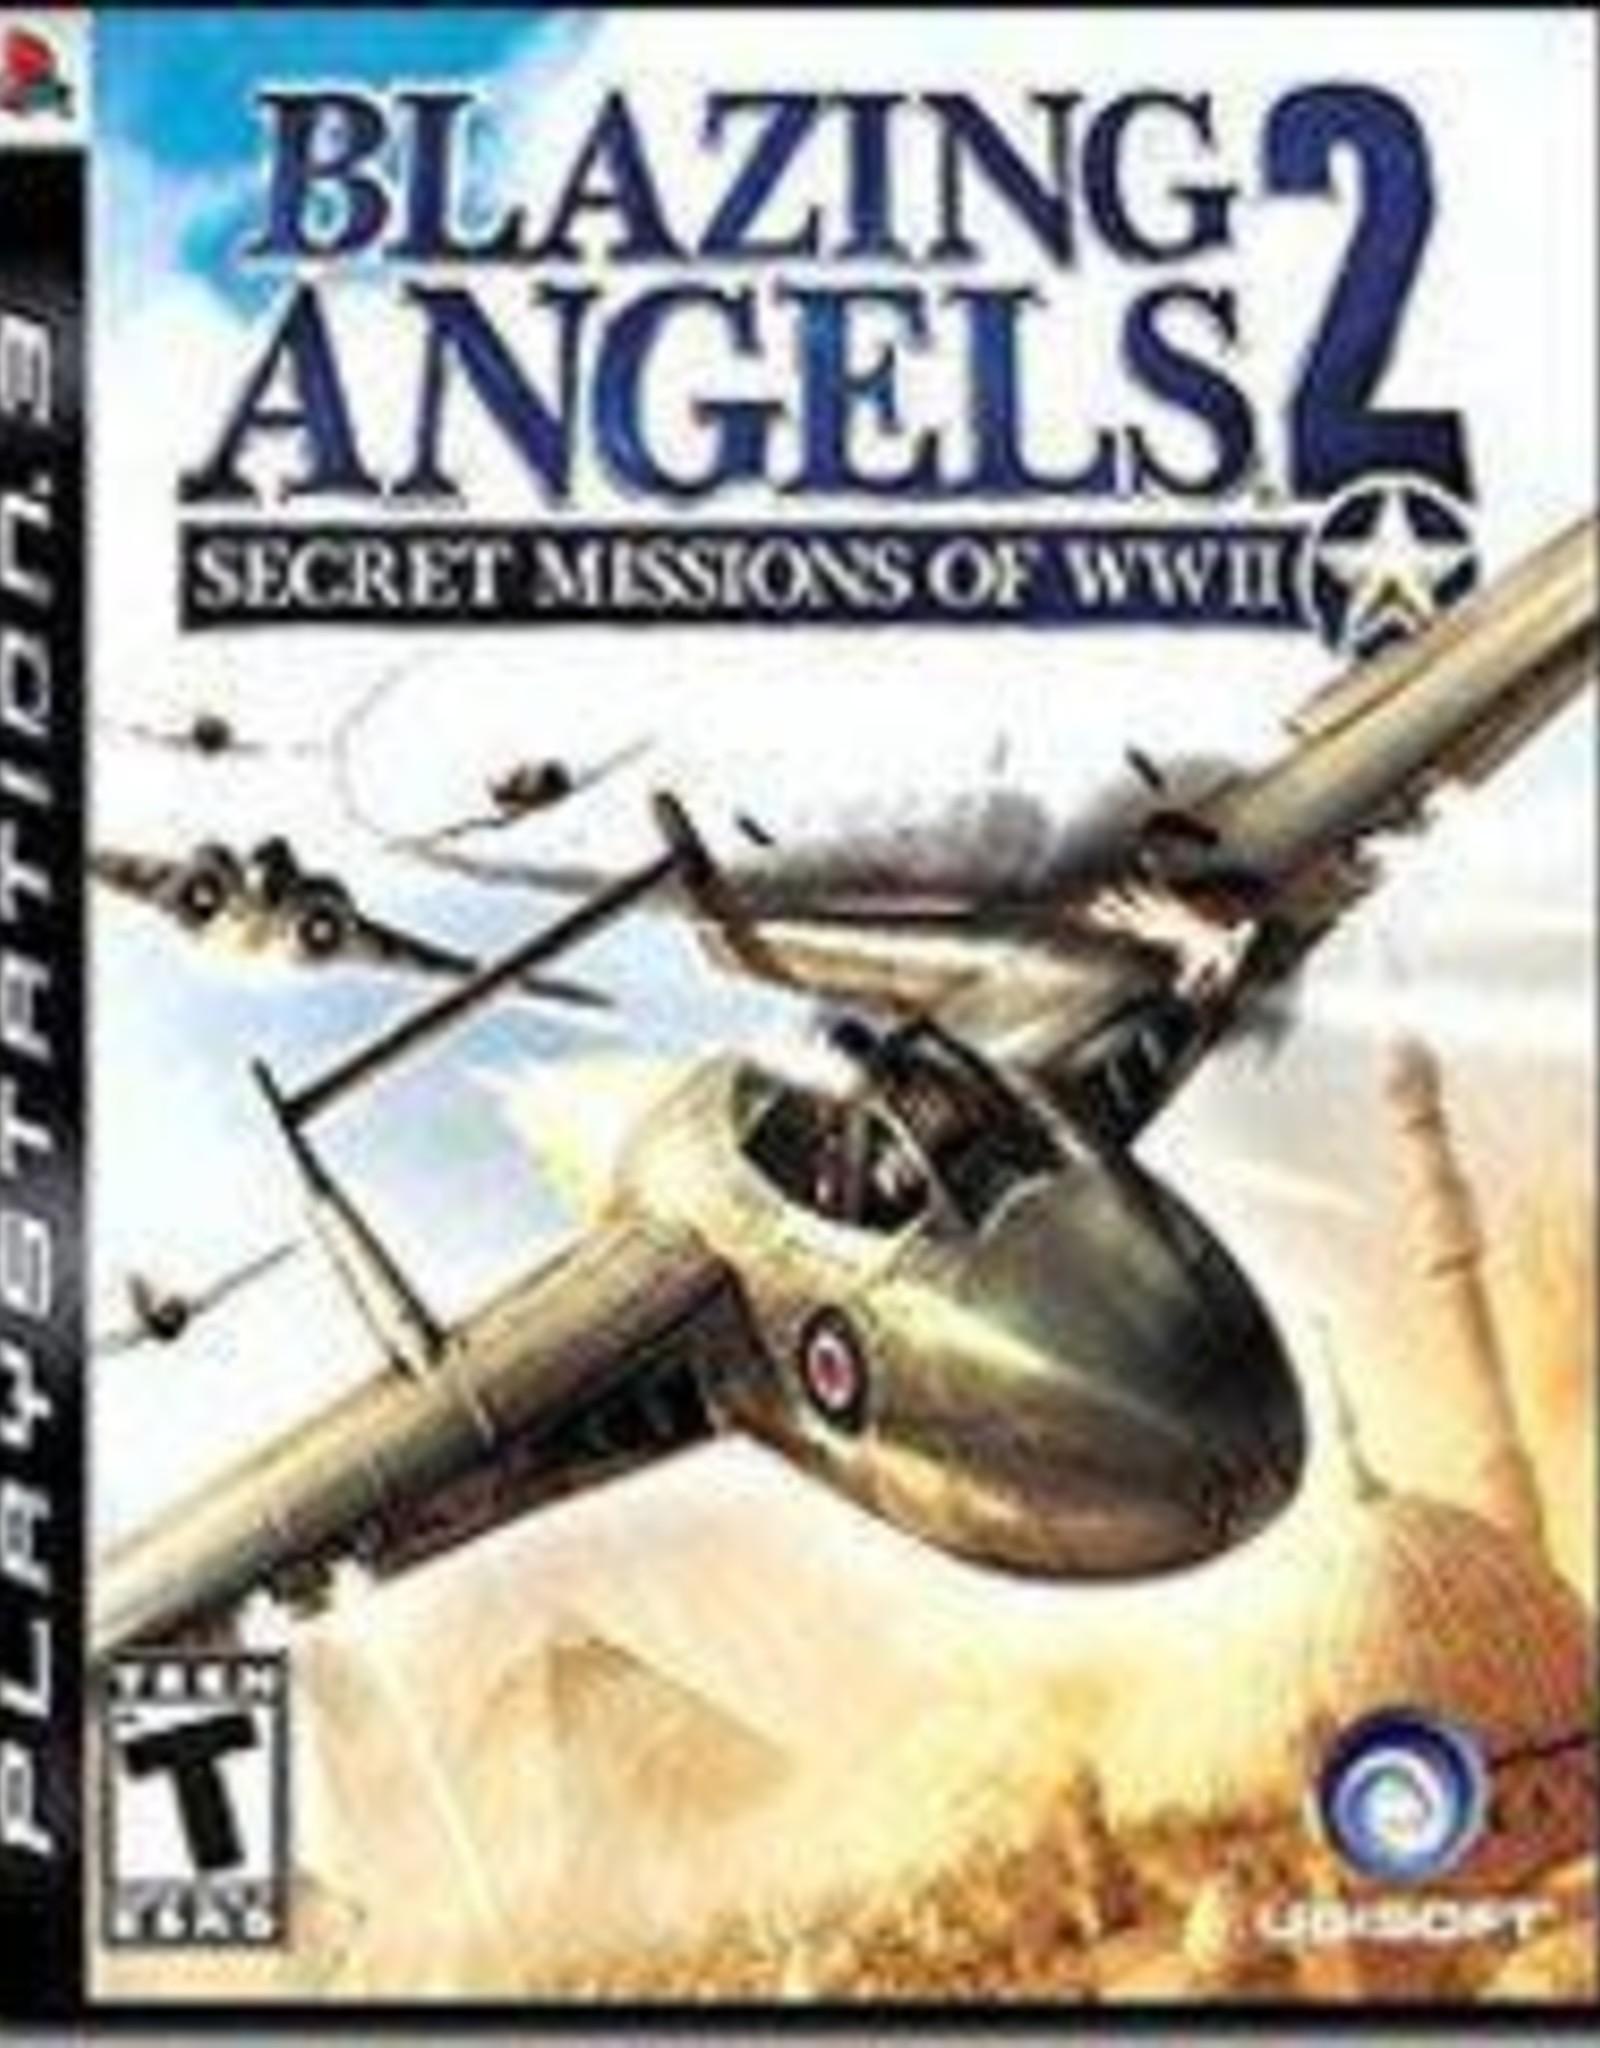 Playstation 3 Blazing Angels 2 Secret Missions of WWII